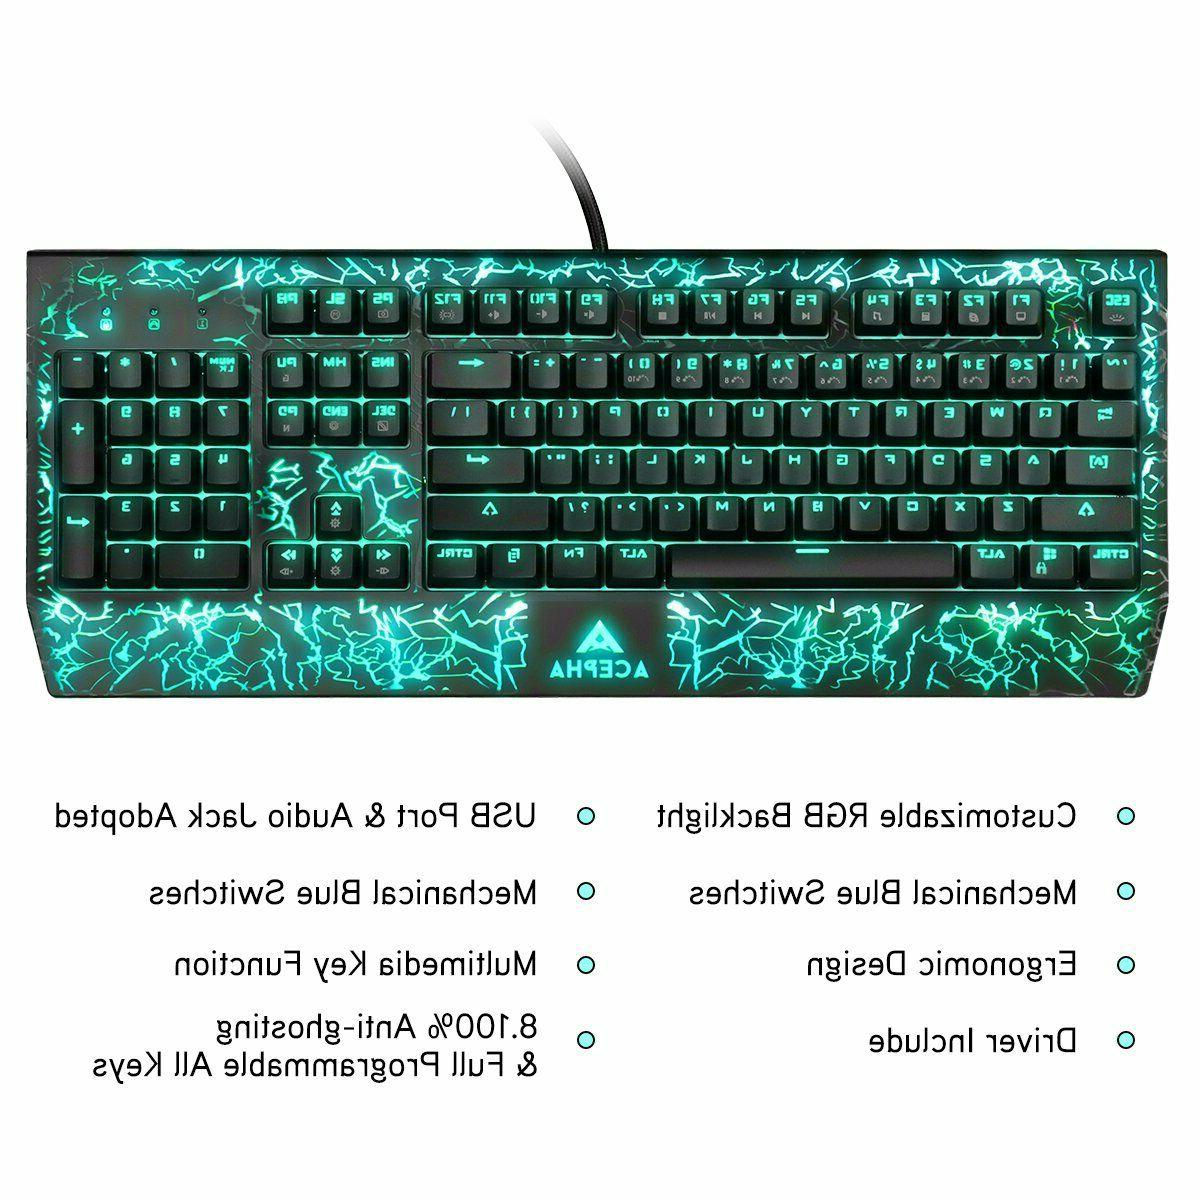 NPET Gaming Keyboard USB Wired Keyboard, Quiet Ergonomic